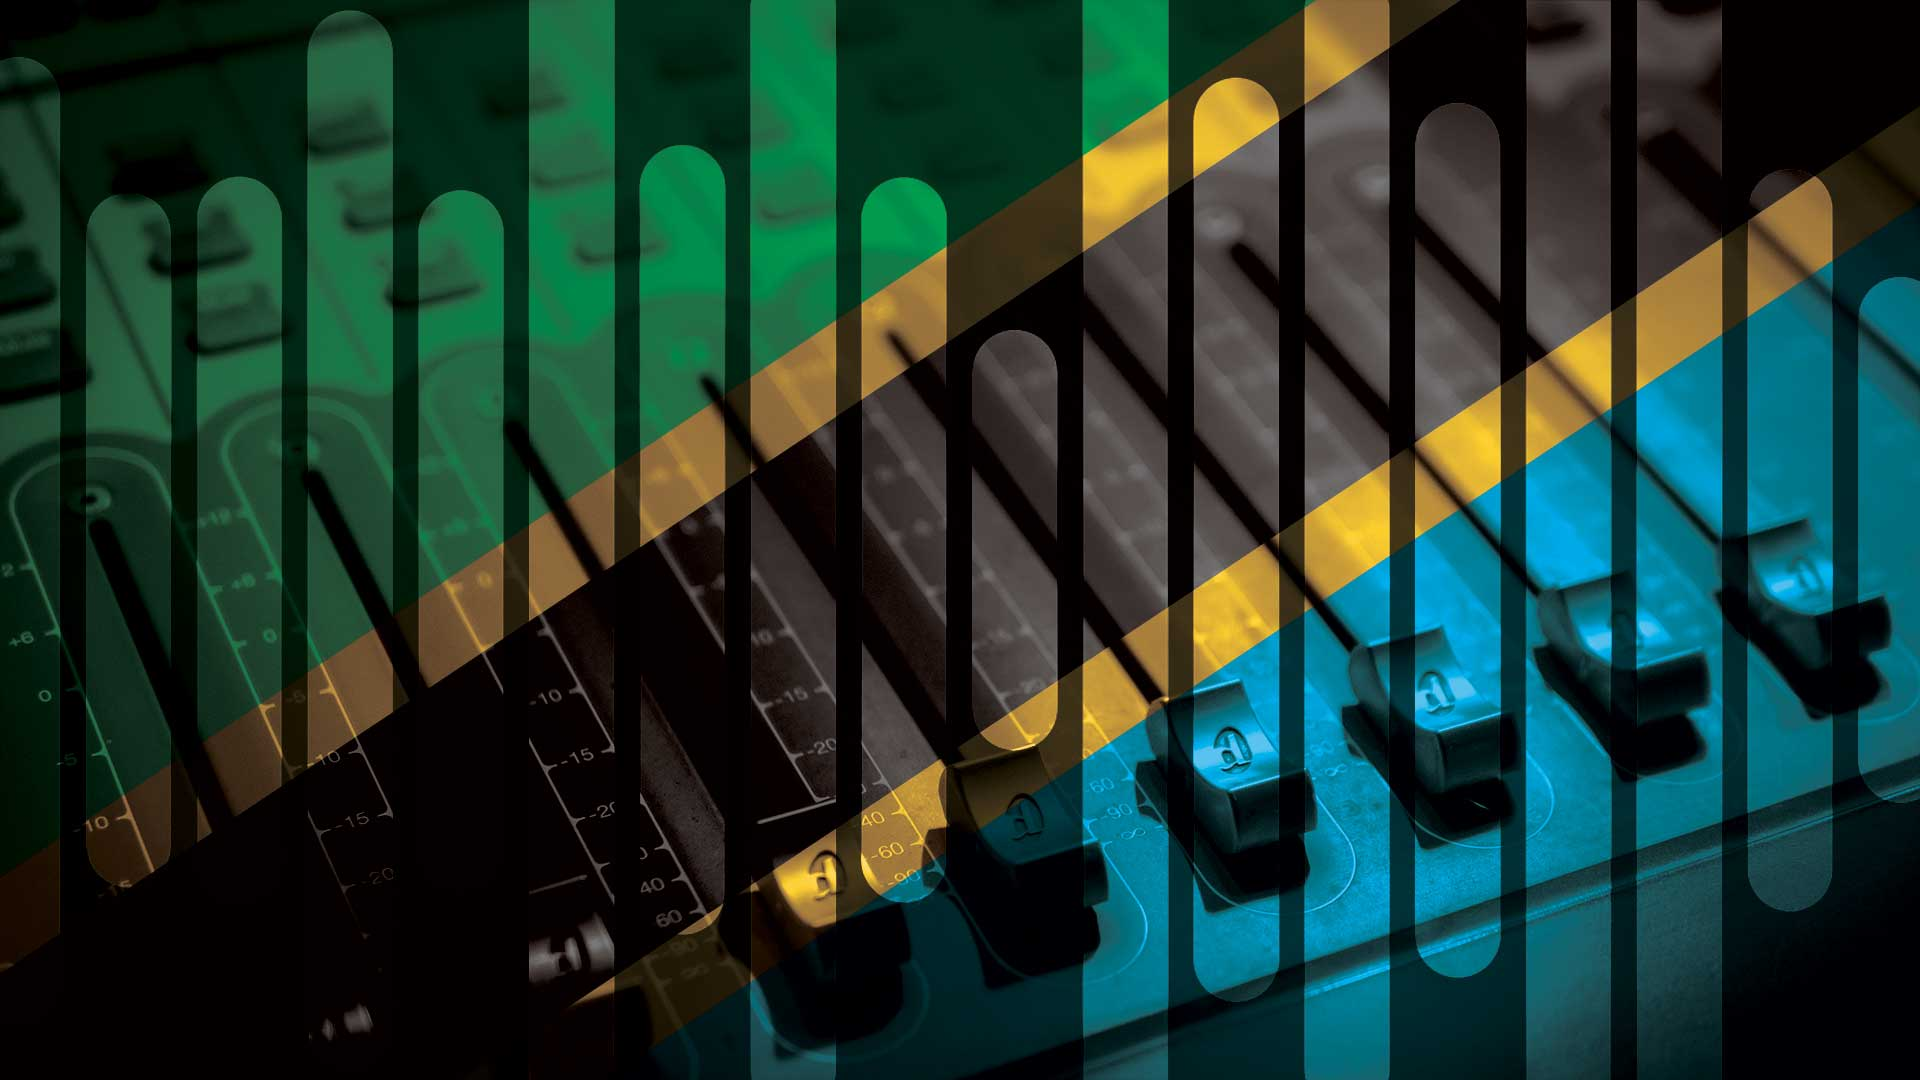 Voice-Over Services Tanzania - Voquent